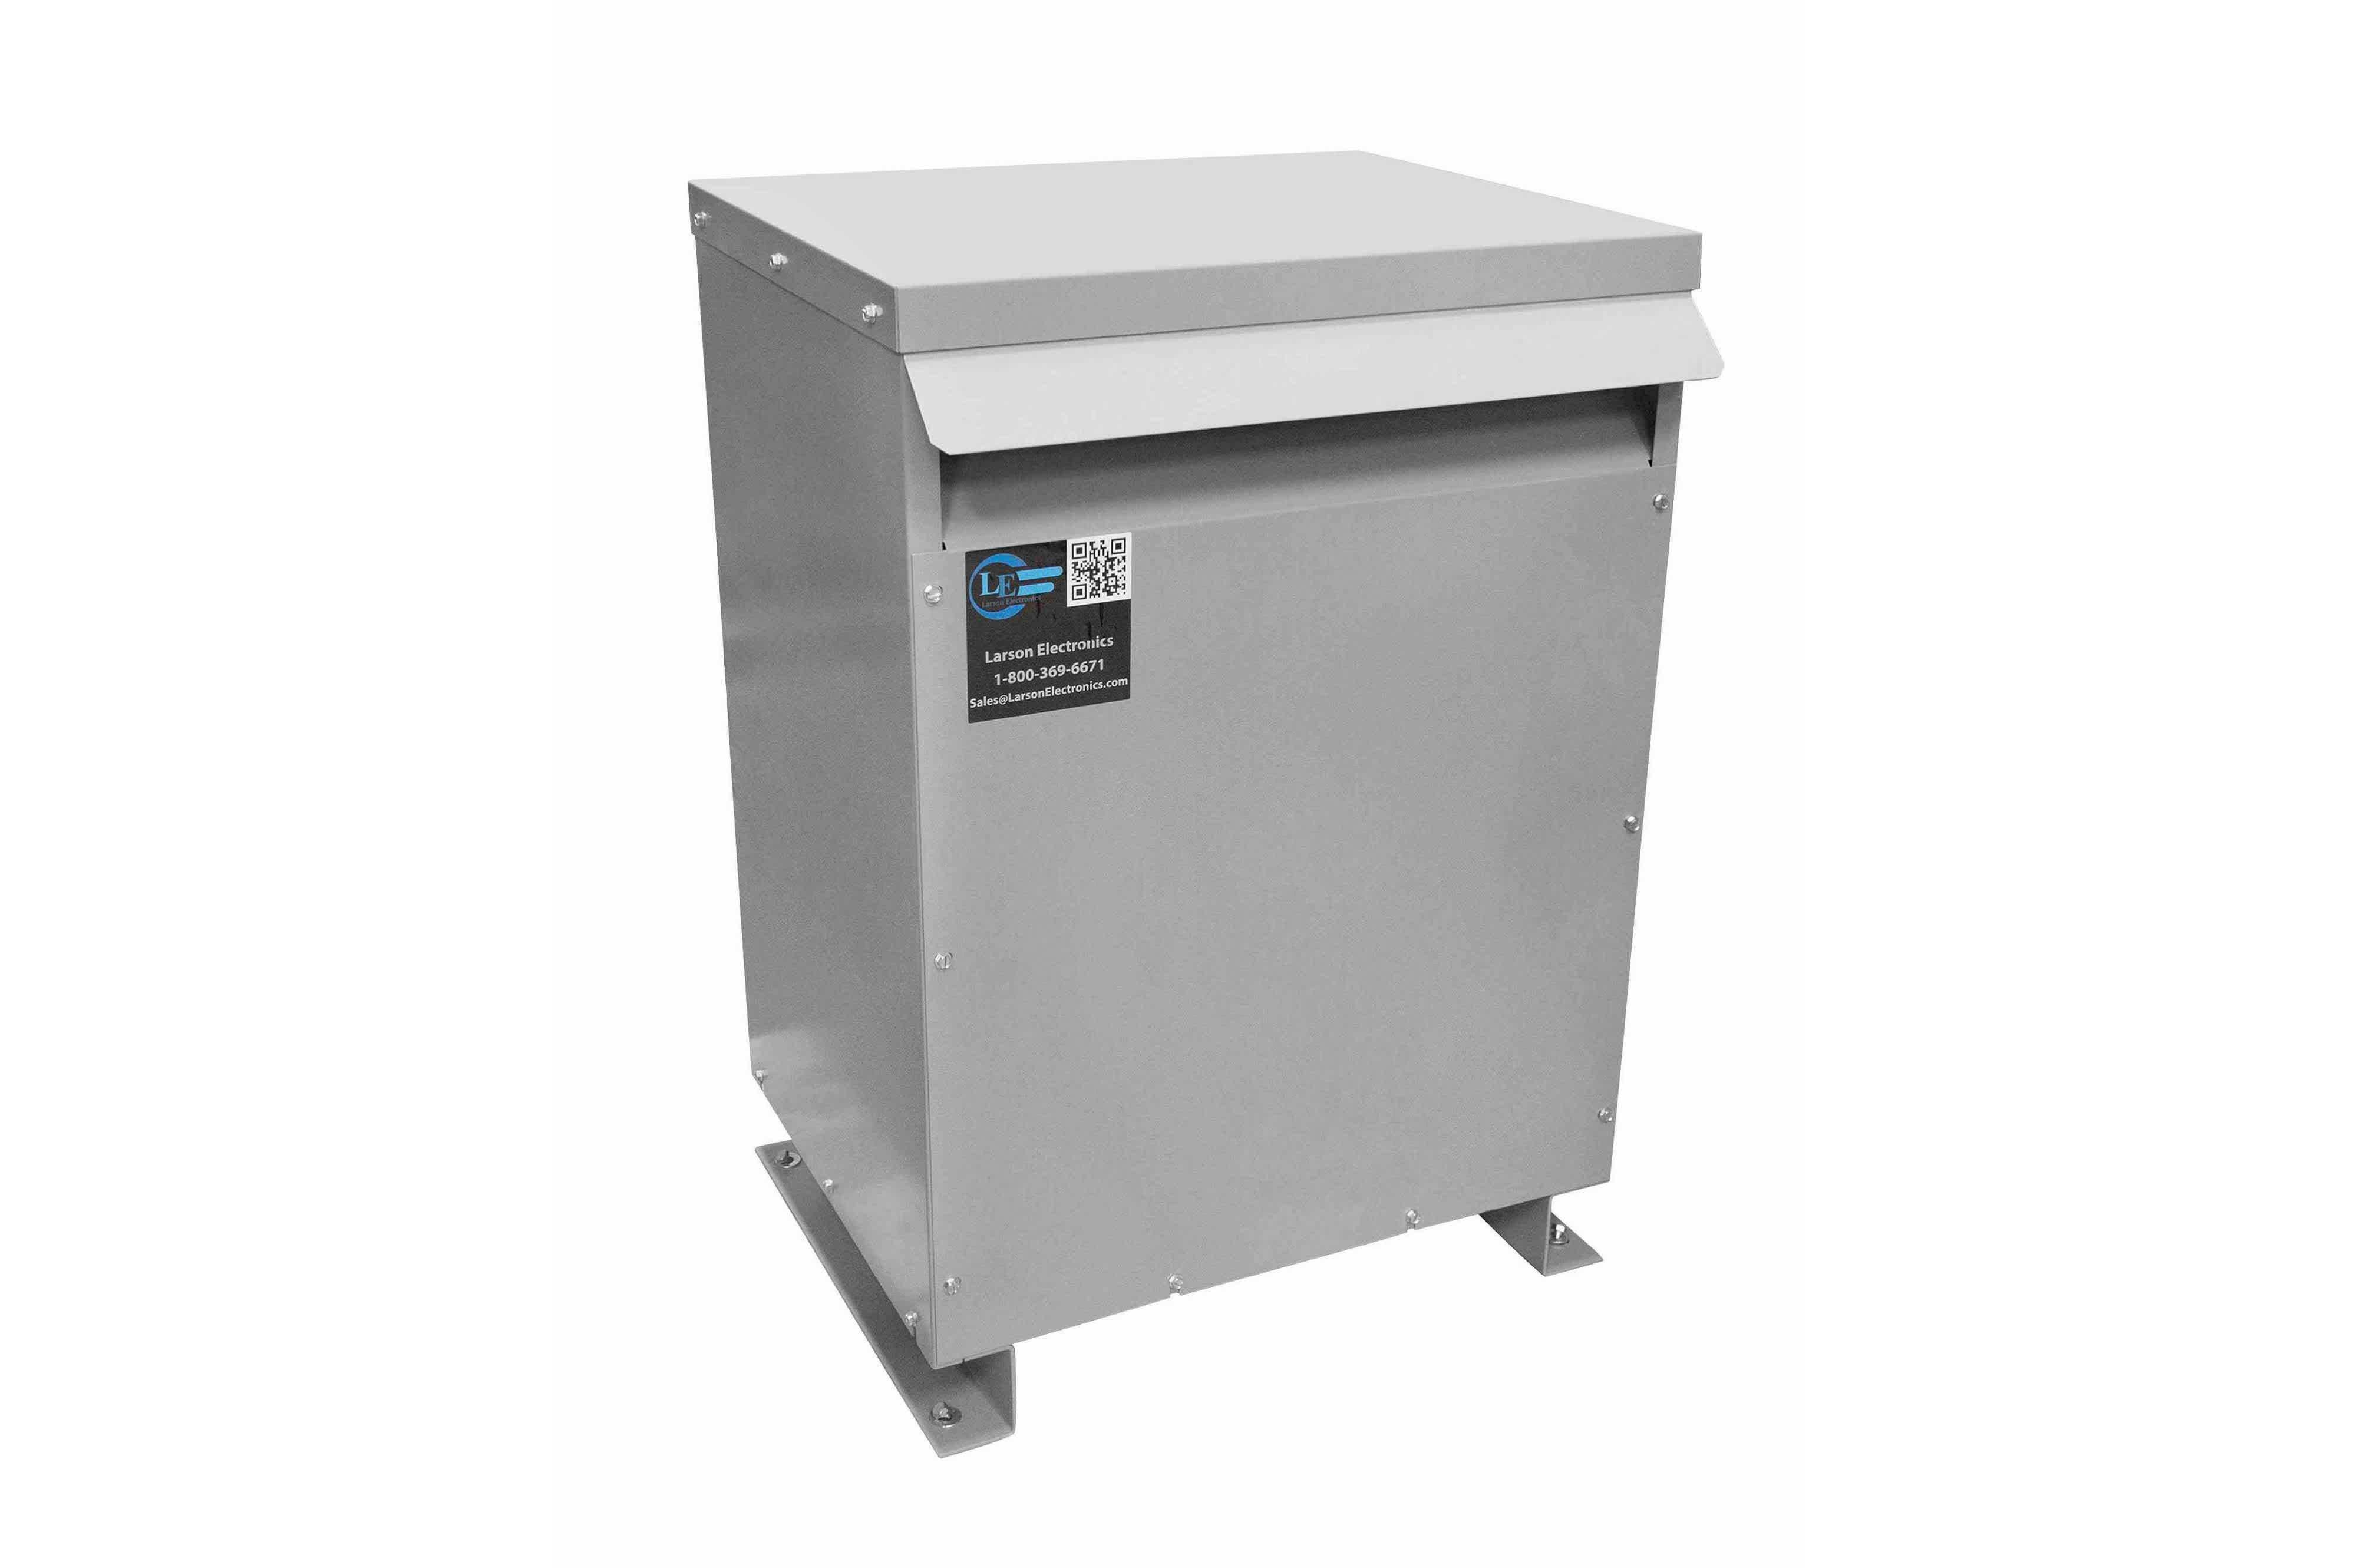 37.5 kVA 3PH Isolation Transformer, 240V Wye Primary, 600Y/347 Wye-N Secondary, N3R, Ventilated, 60 Hz